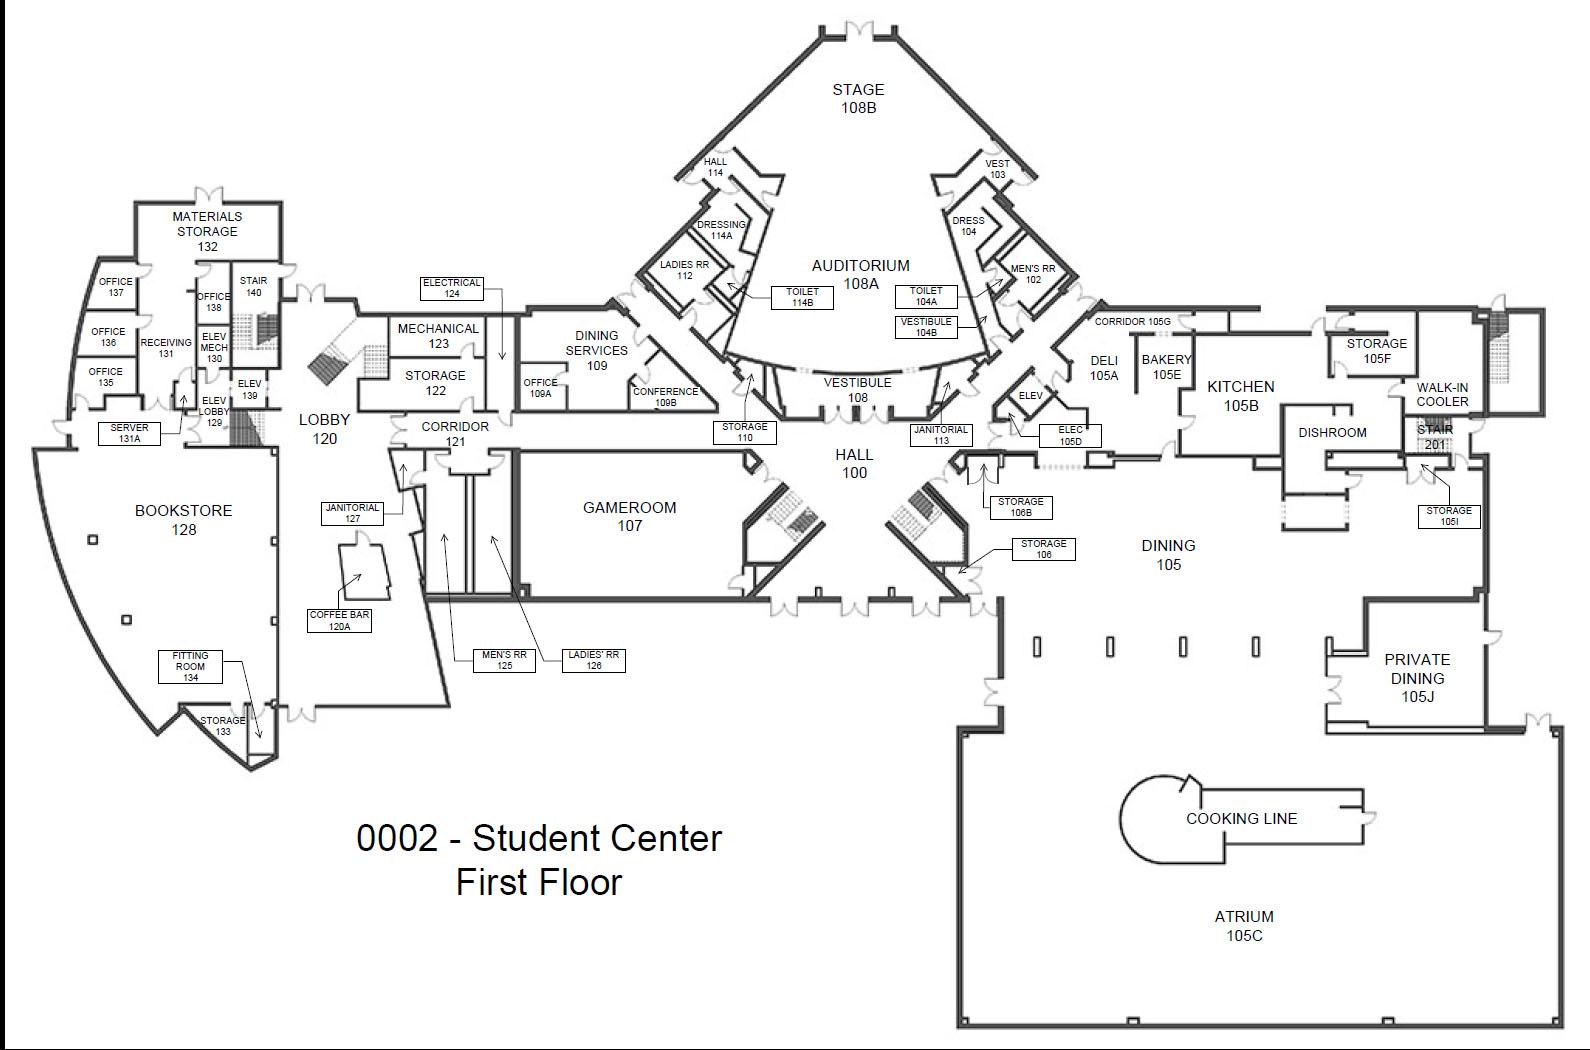 building-floorplan-student-center-level-one